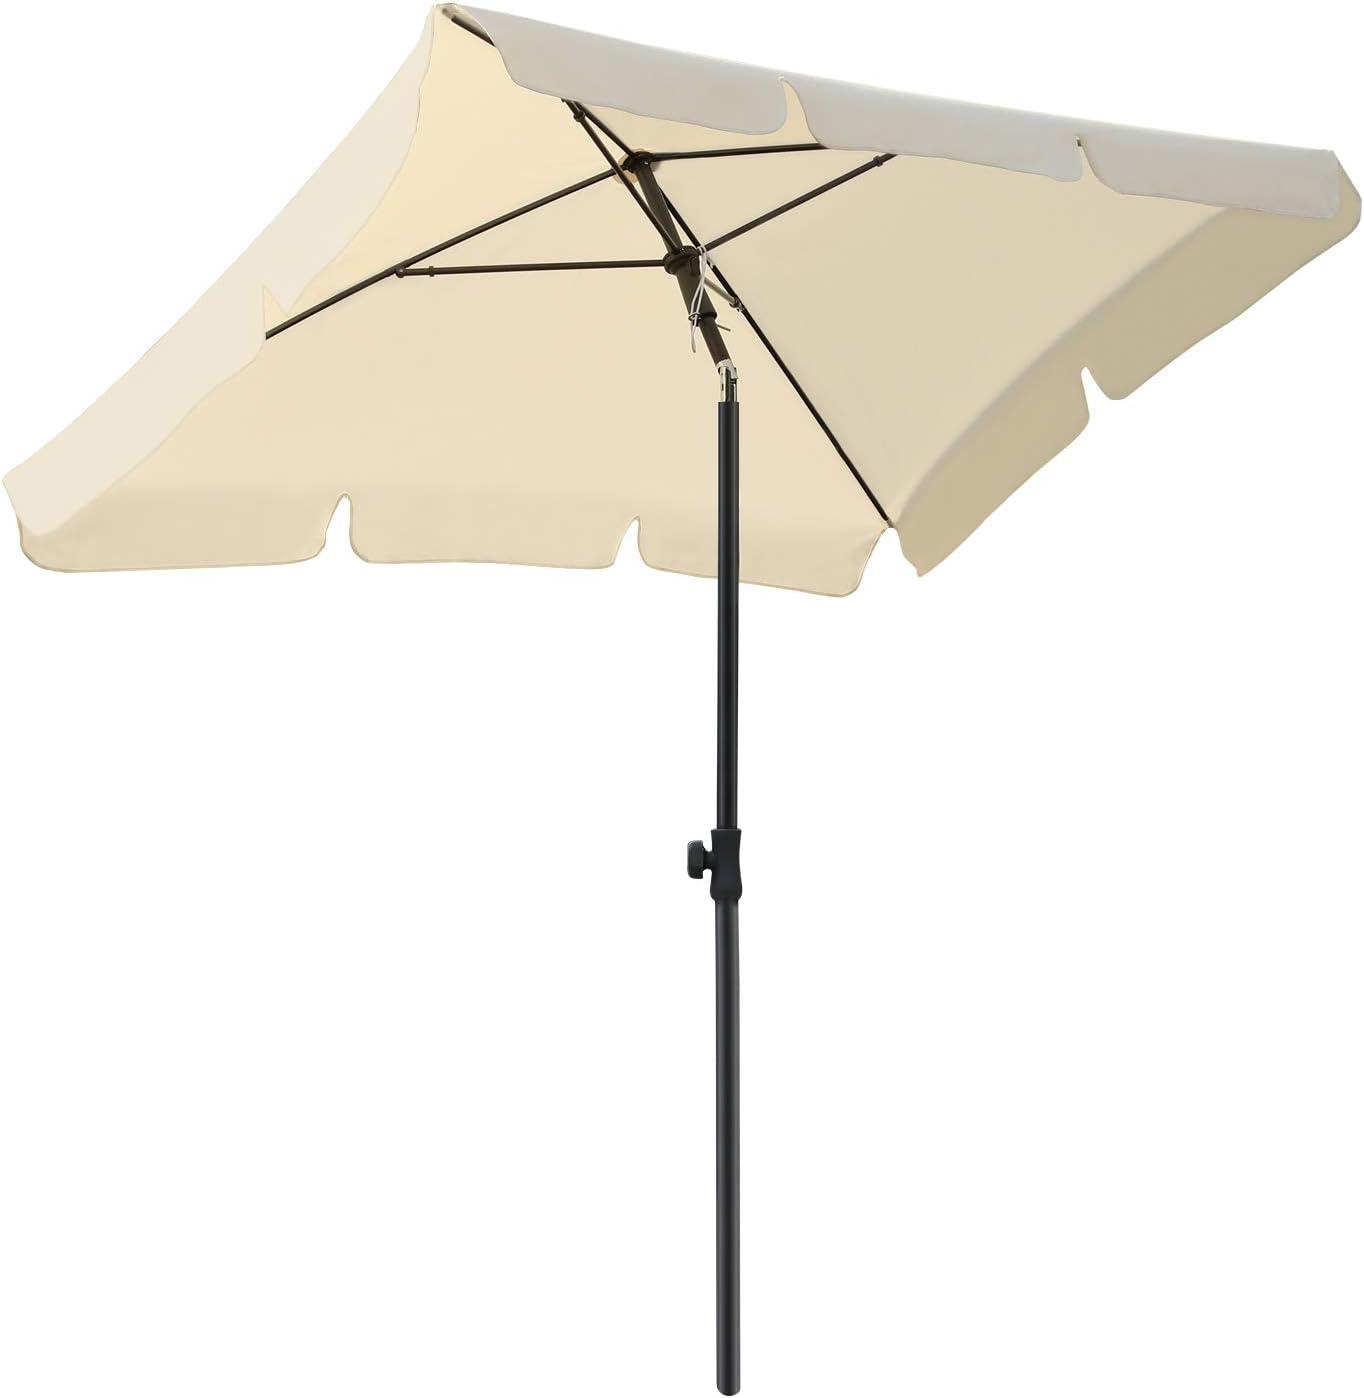 MVPower Parasol, 200 x 125 cm Sombrilla Rectangular Plegable, Sombrilla UV UPF 50+, Sombrilla Impermeable Protección solar para Jardín, Balcón y Terraza